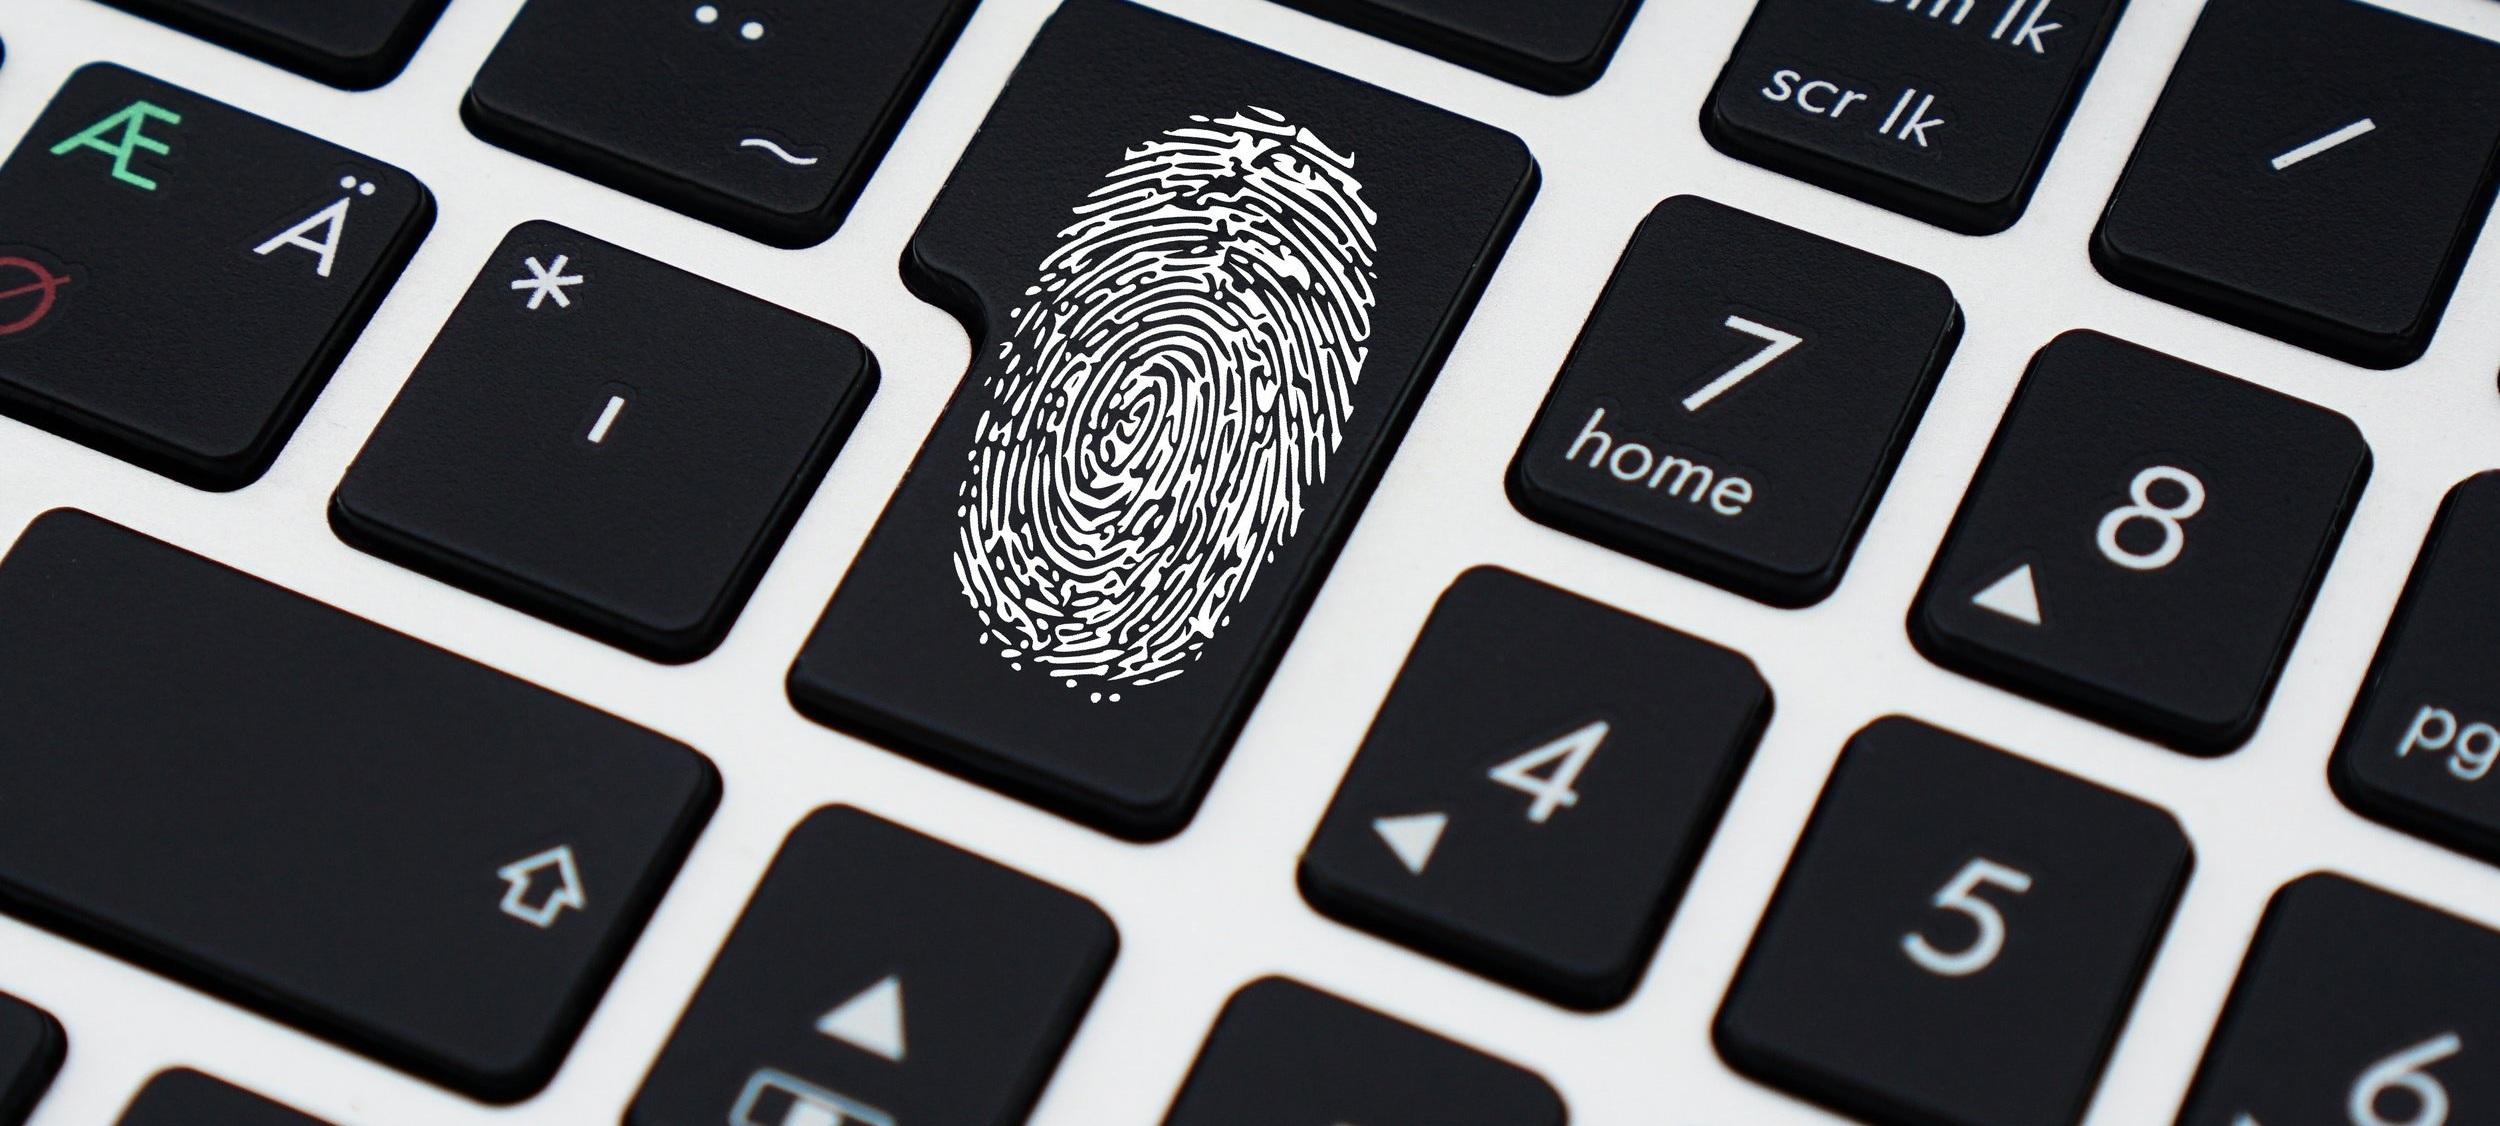 Картинки по запросу Is it safe to use biometric data